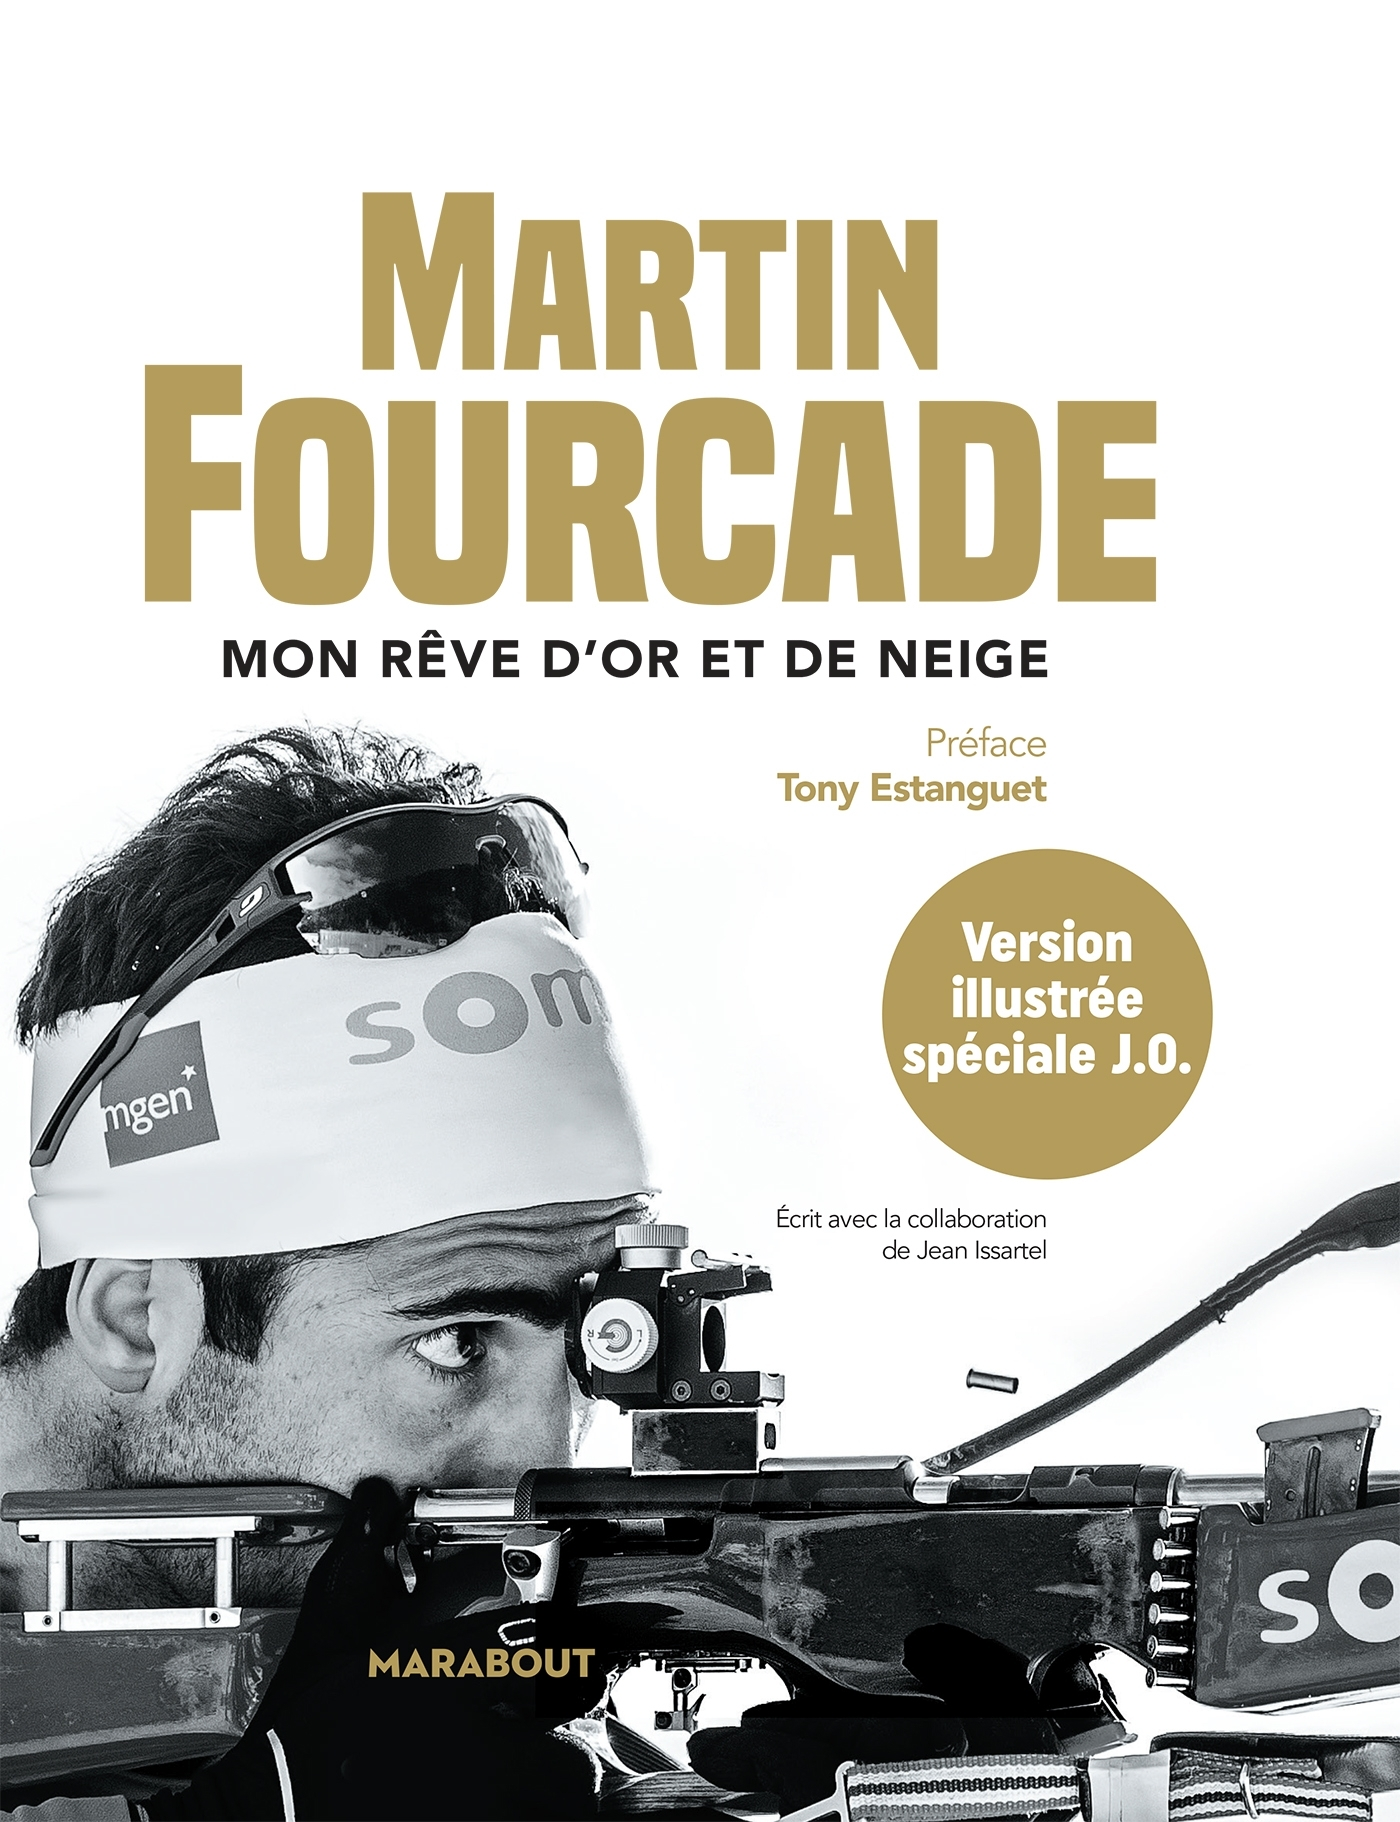 MARTIN FOURCADE - EDITION ILLUSTREE